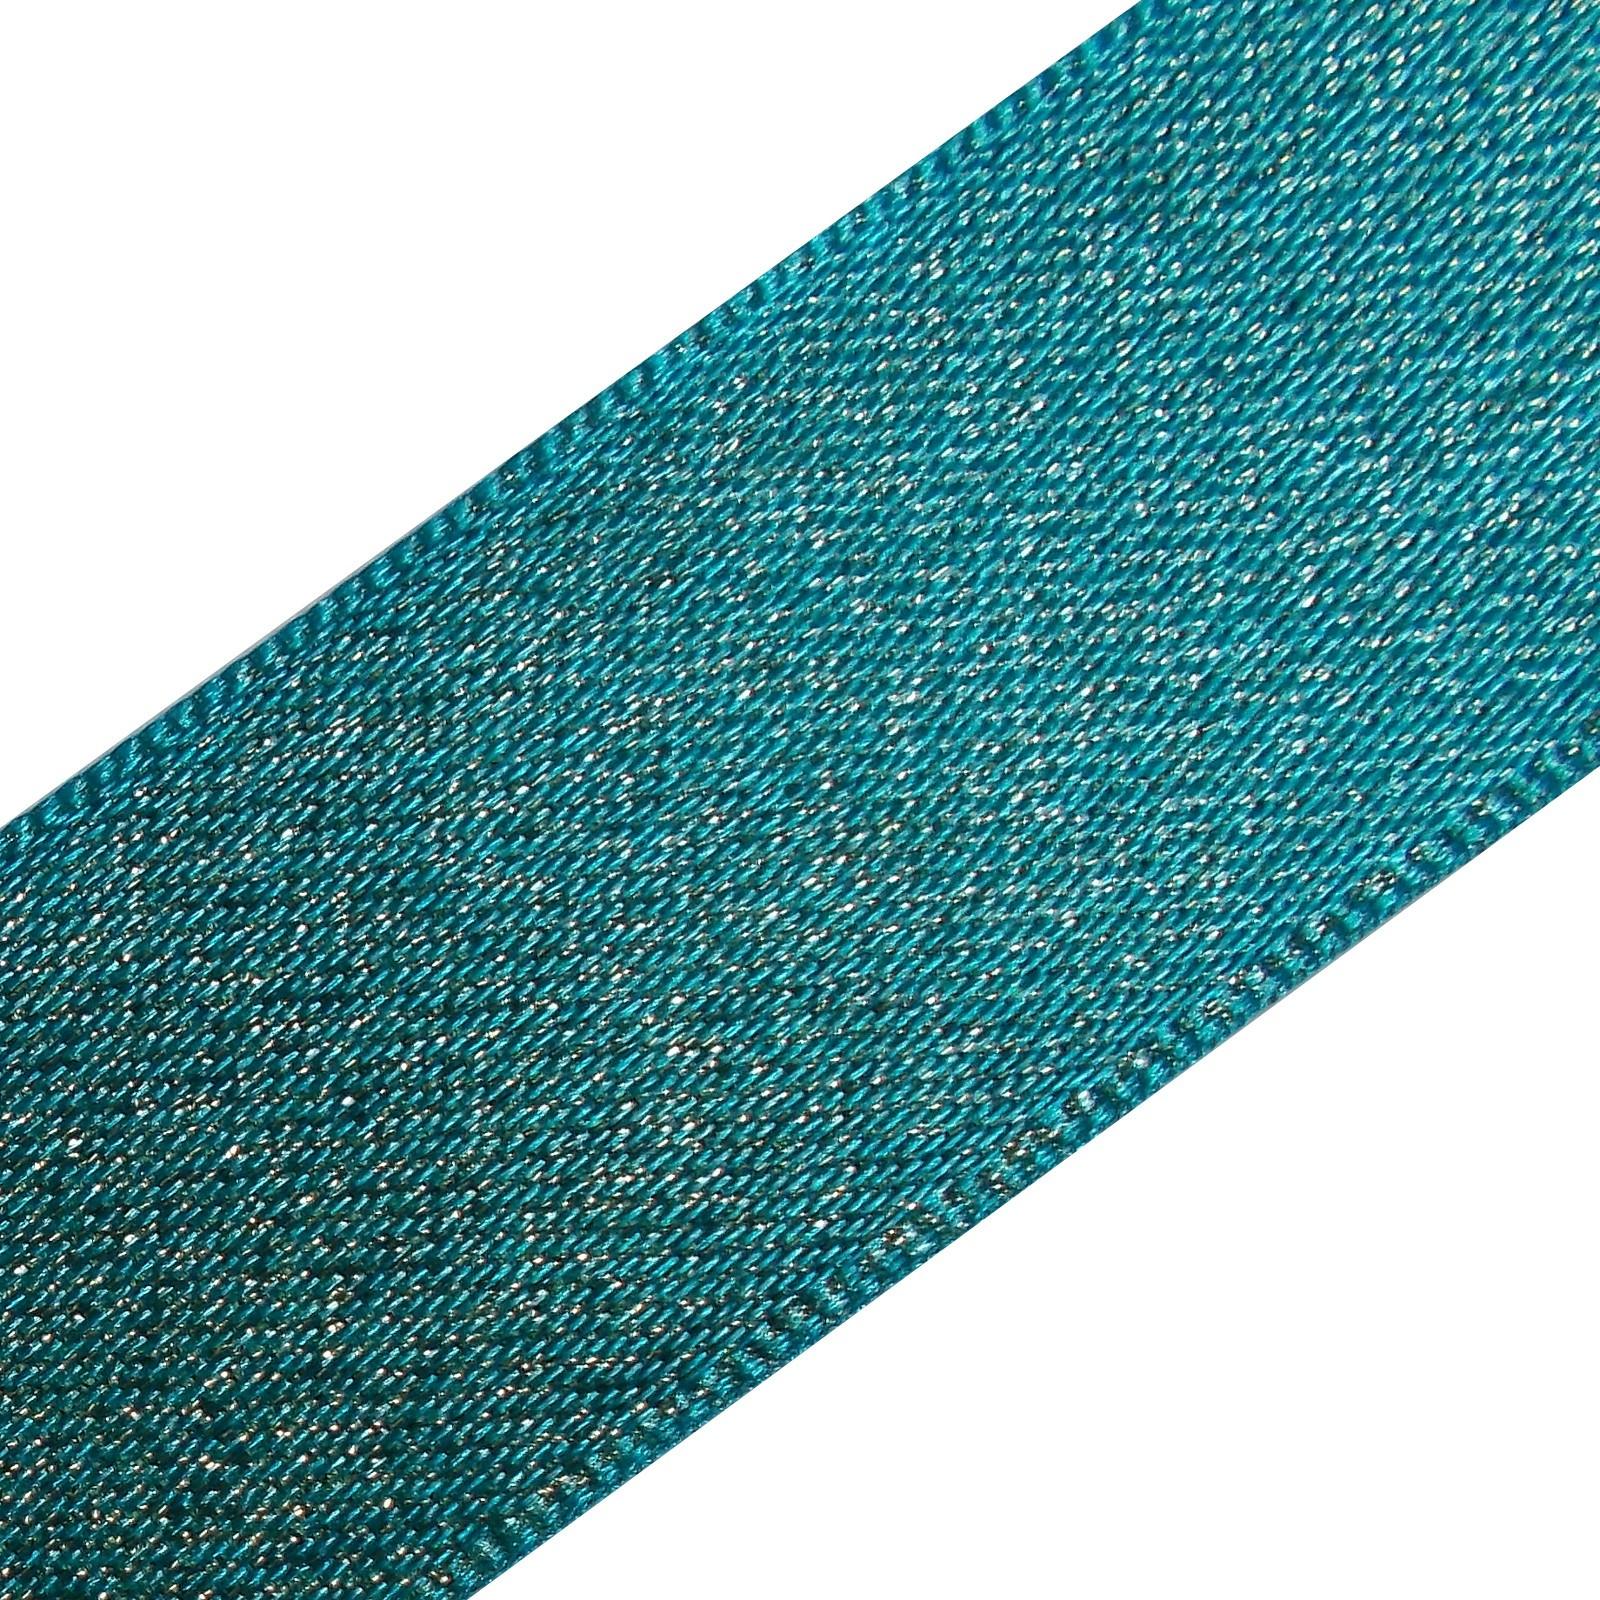 Berisfords Glitter Satin Ribbon 25mm wide Blue 3 metre length